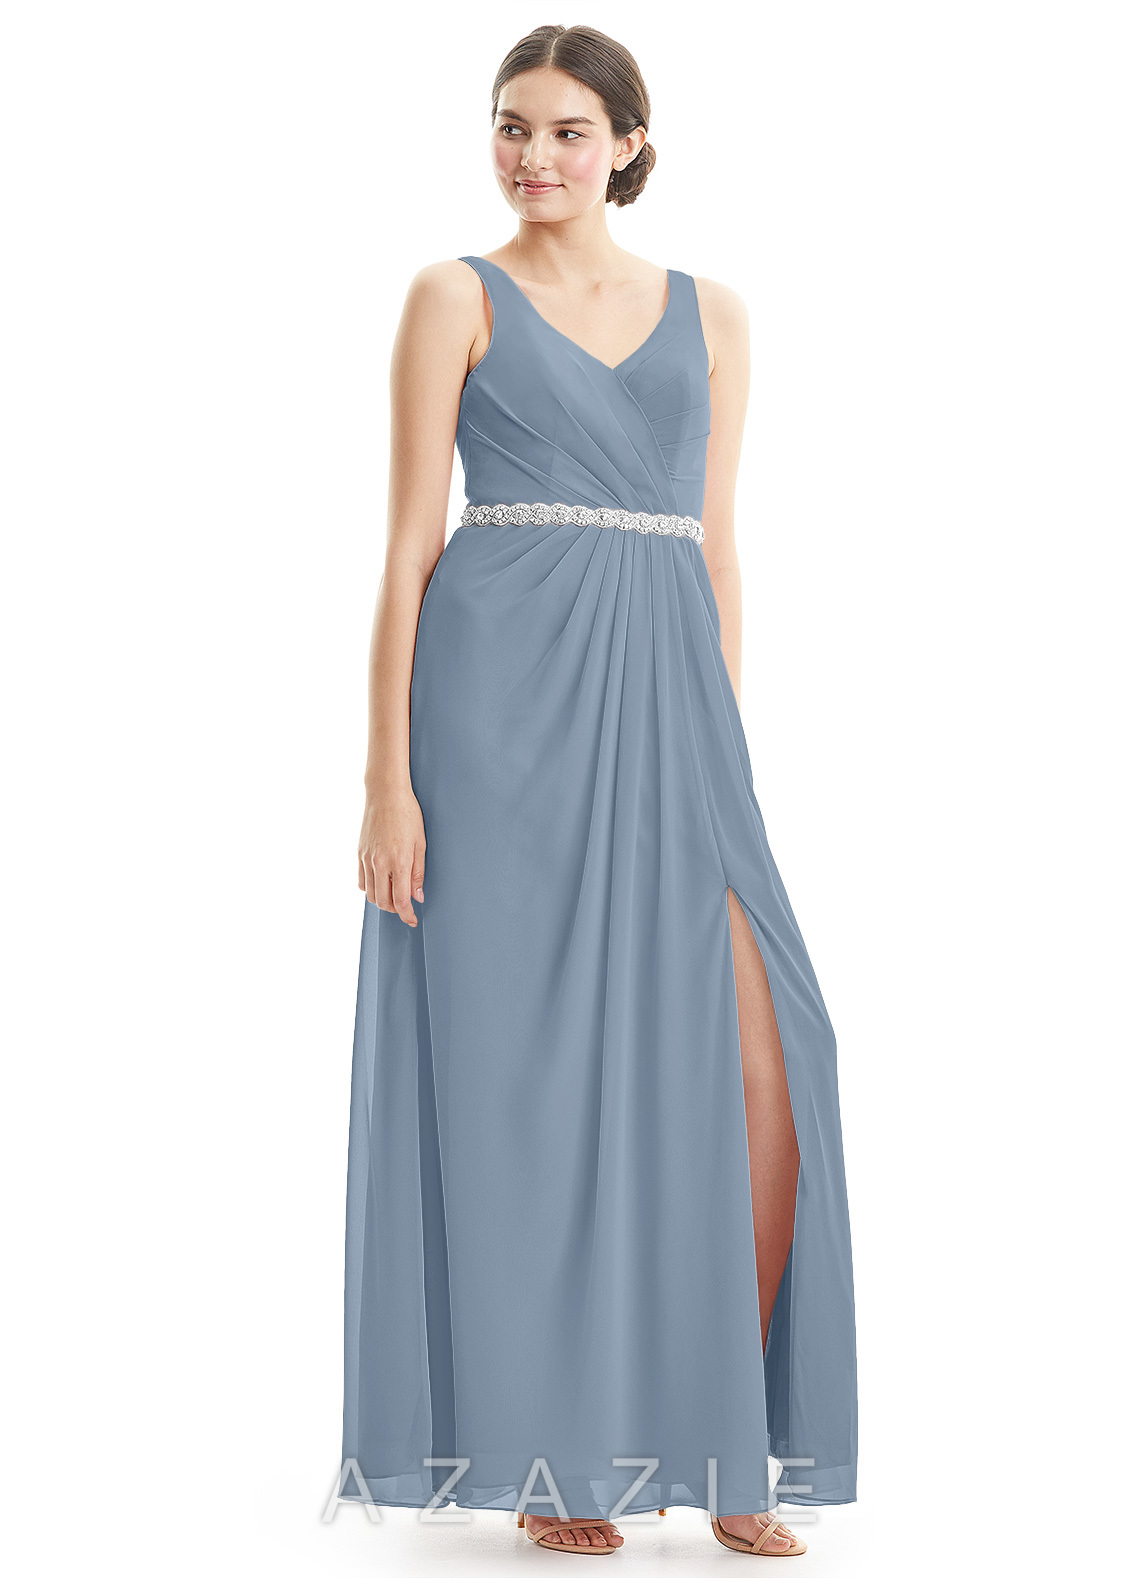 Azazie Jocelyn Bridesmaid Dress | Azazie - photo #22